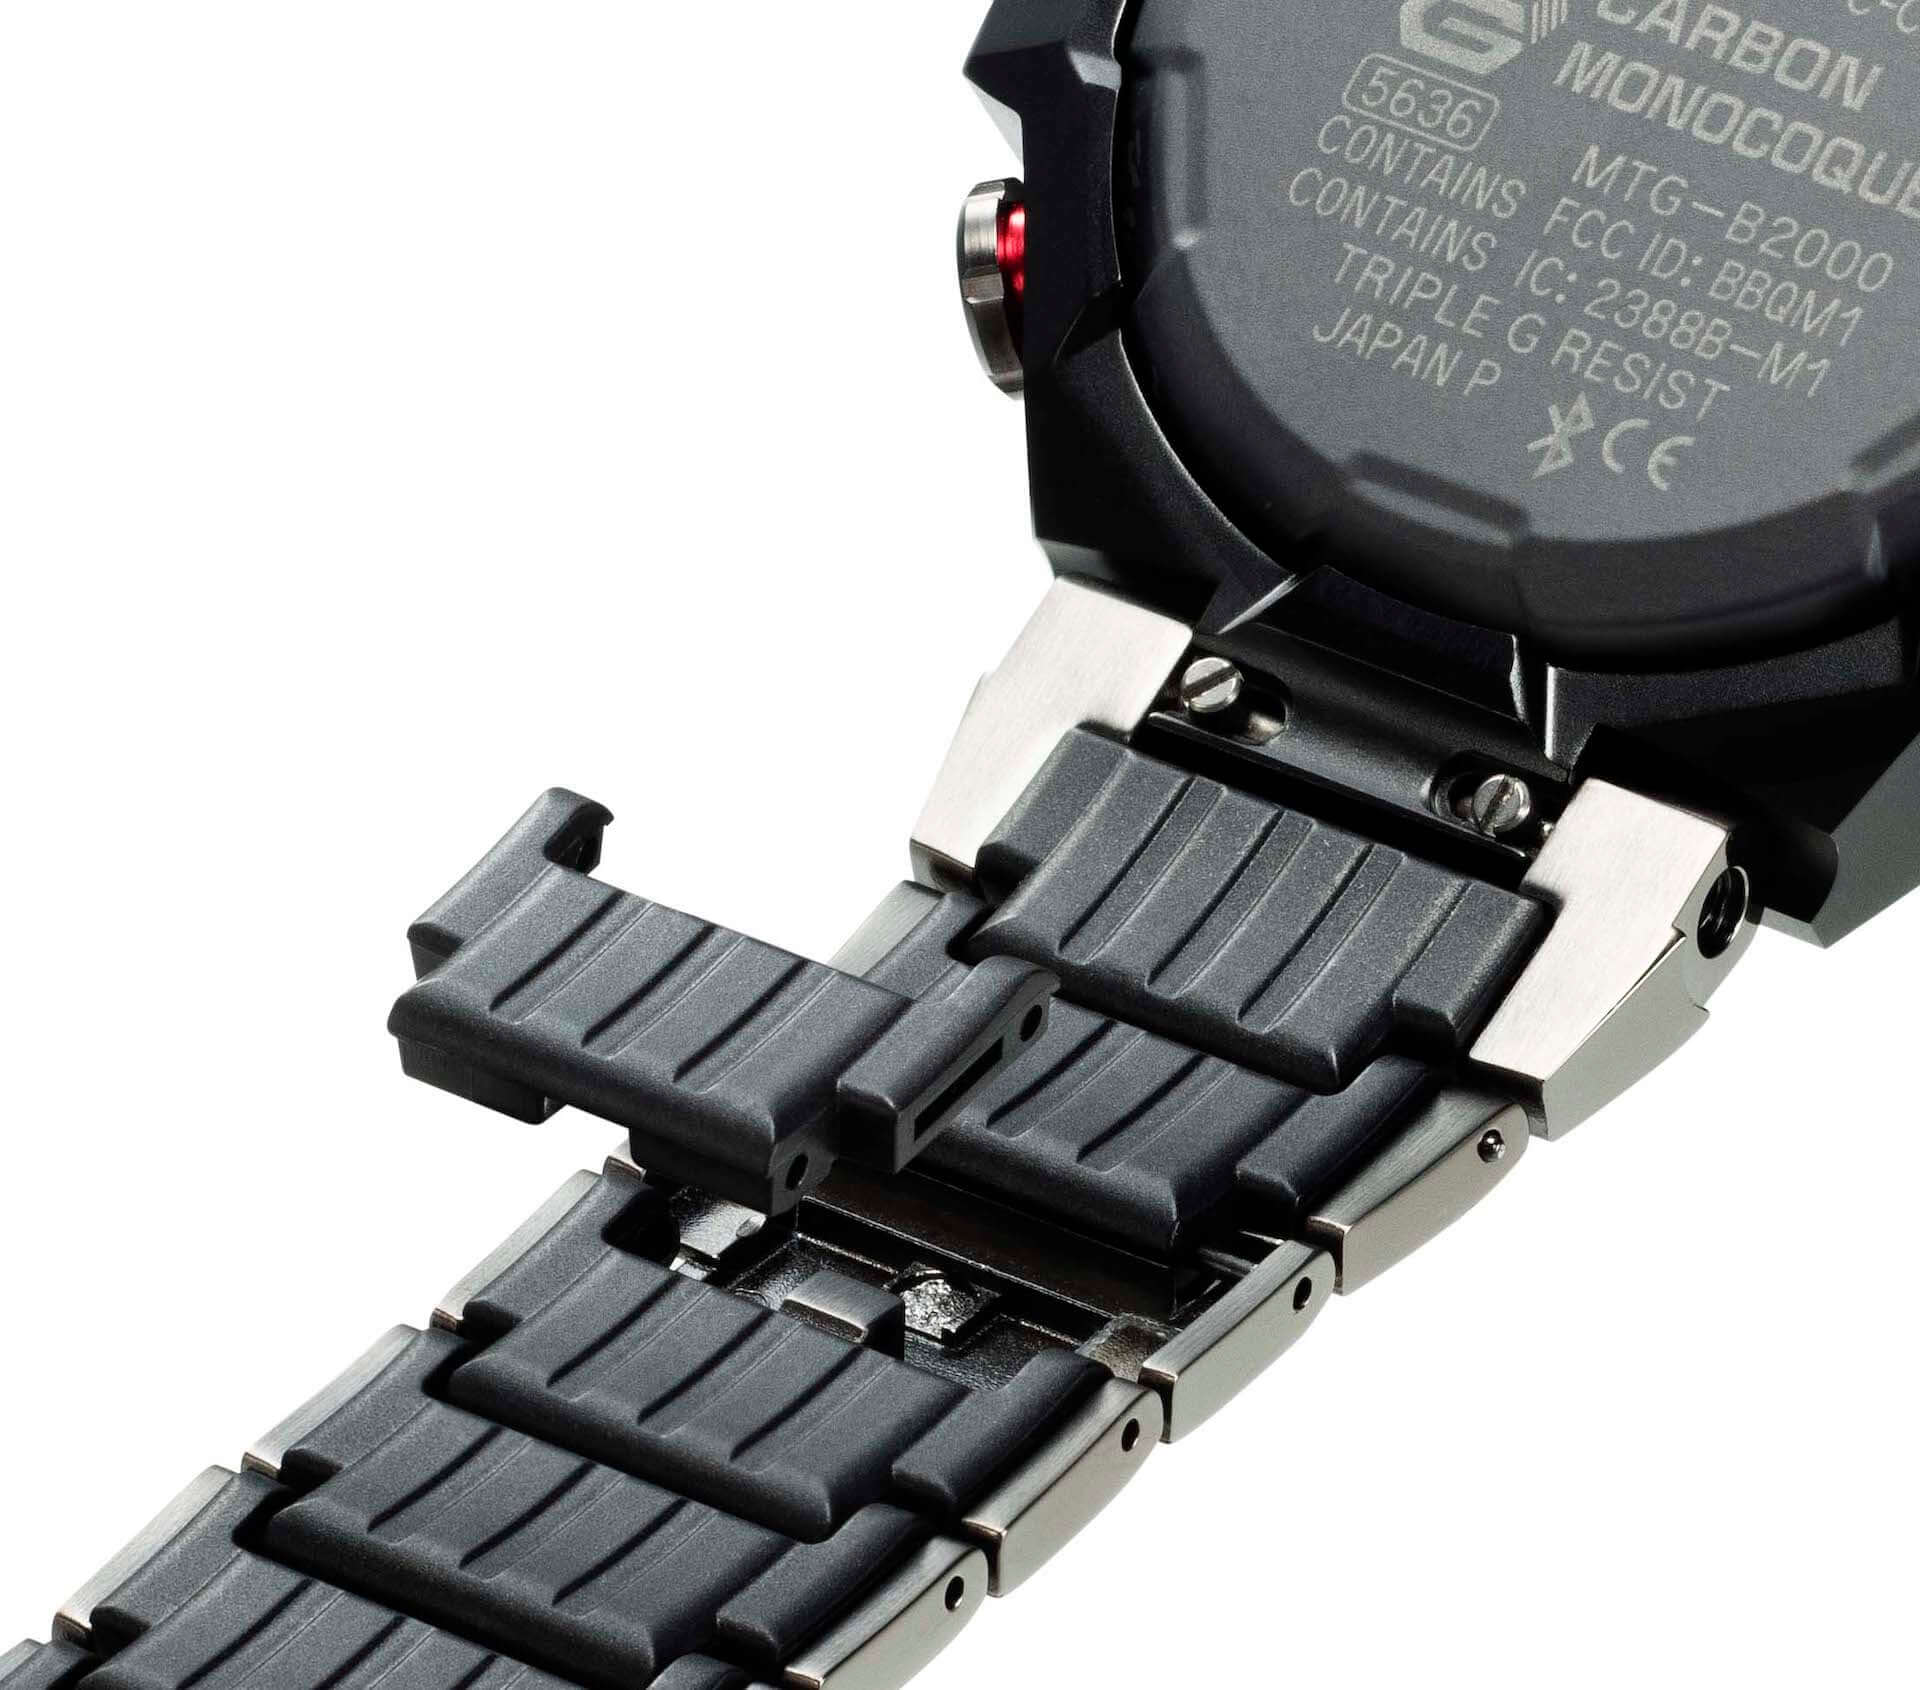 G-SHOCK「MT-G」シリーズに新製品『MTG-B2000BD』が登場!新開発の「デュアルコアガード構造」を採用しミドルサイズを継承 tech200930_g-shock_5-1920x1690